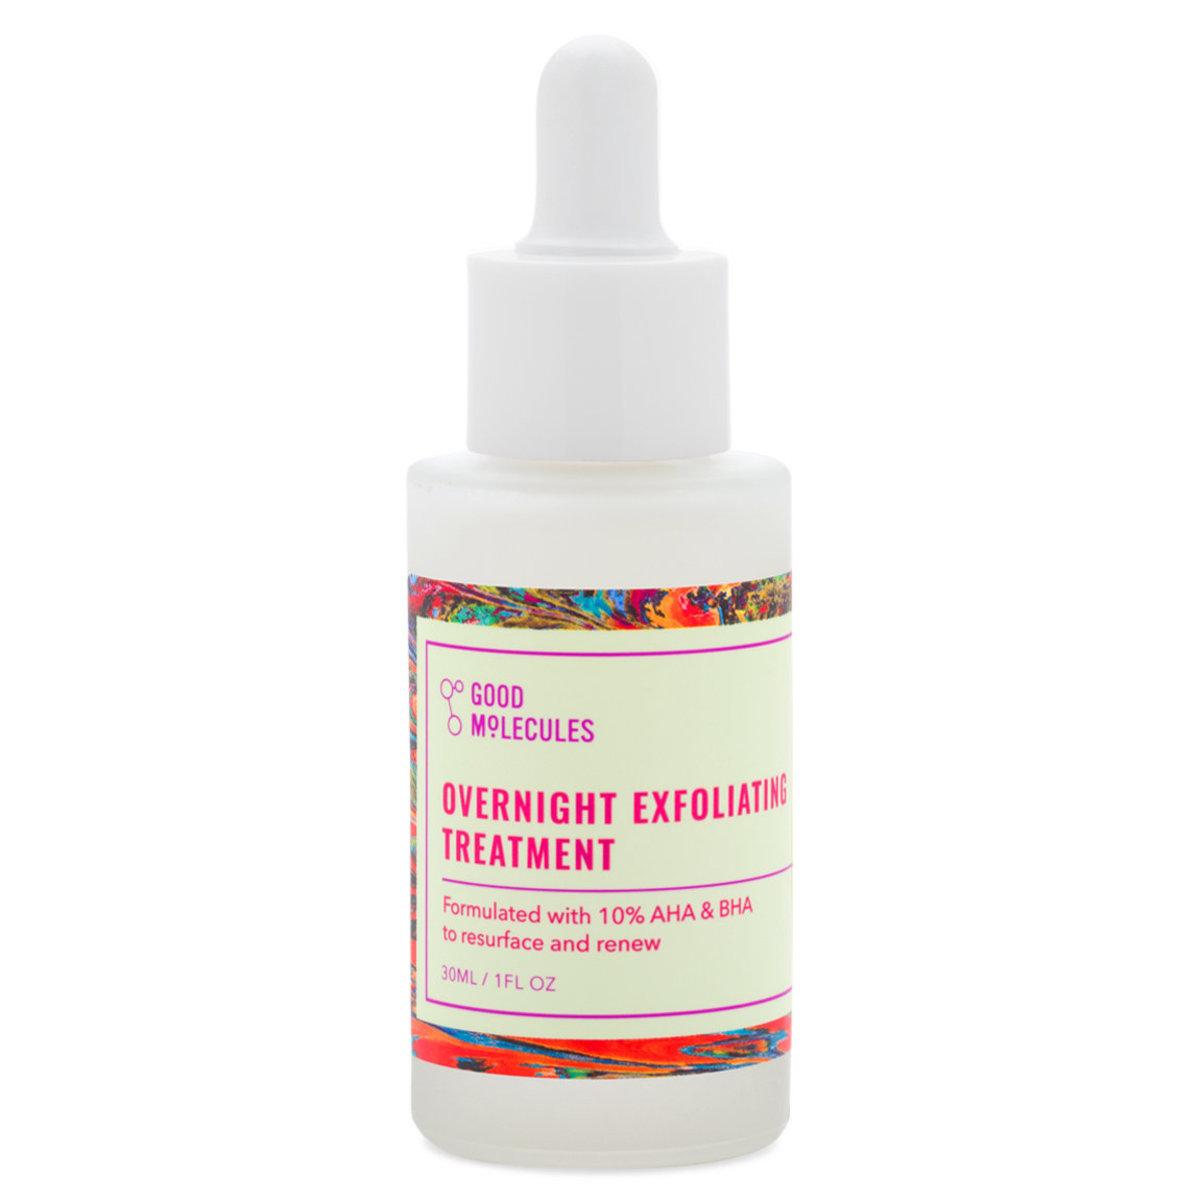 Overnight Exfoliating Treatment (30ml)[Parallel Import]